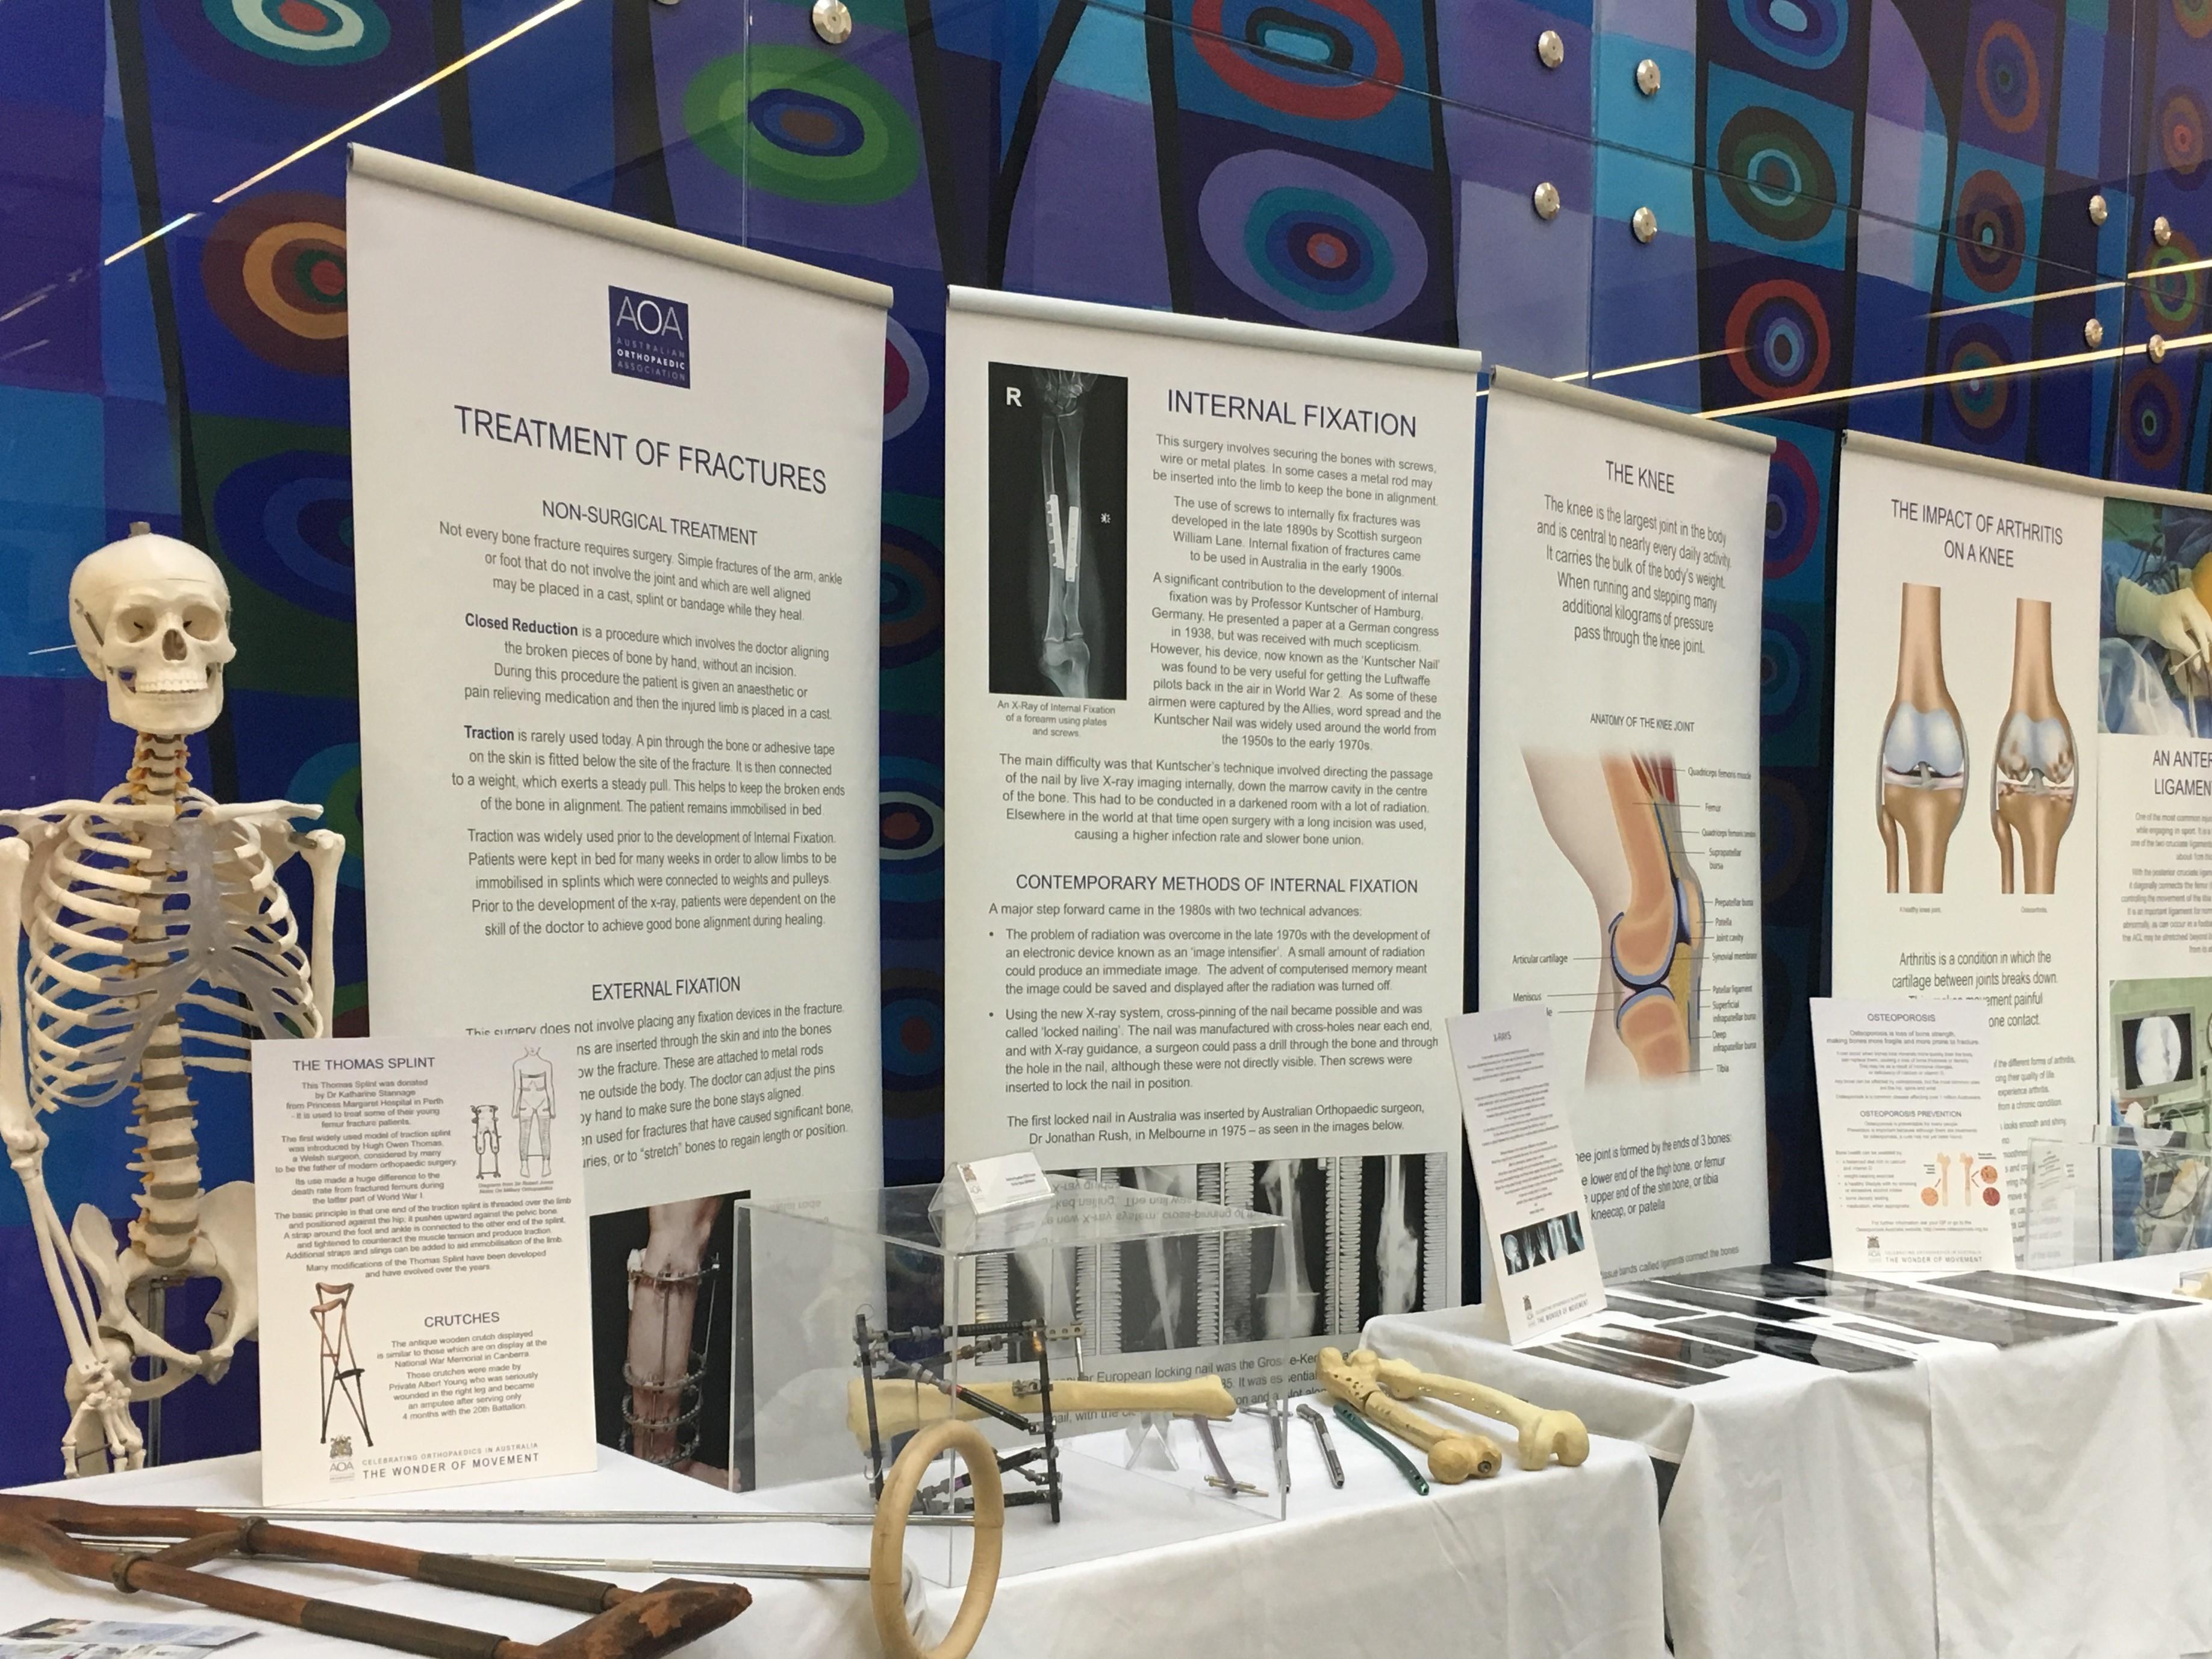 Exhibition Displays Adelaide : Travelling exhibition aoa australian orthopaedic association